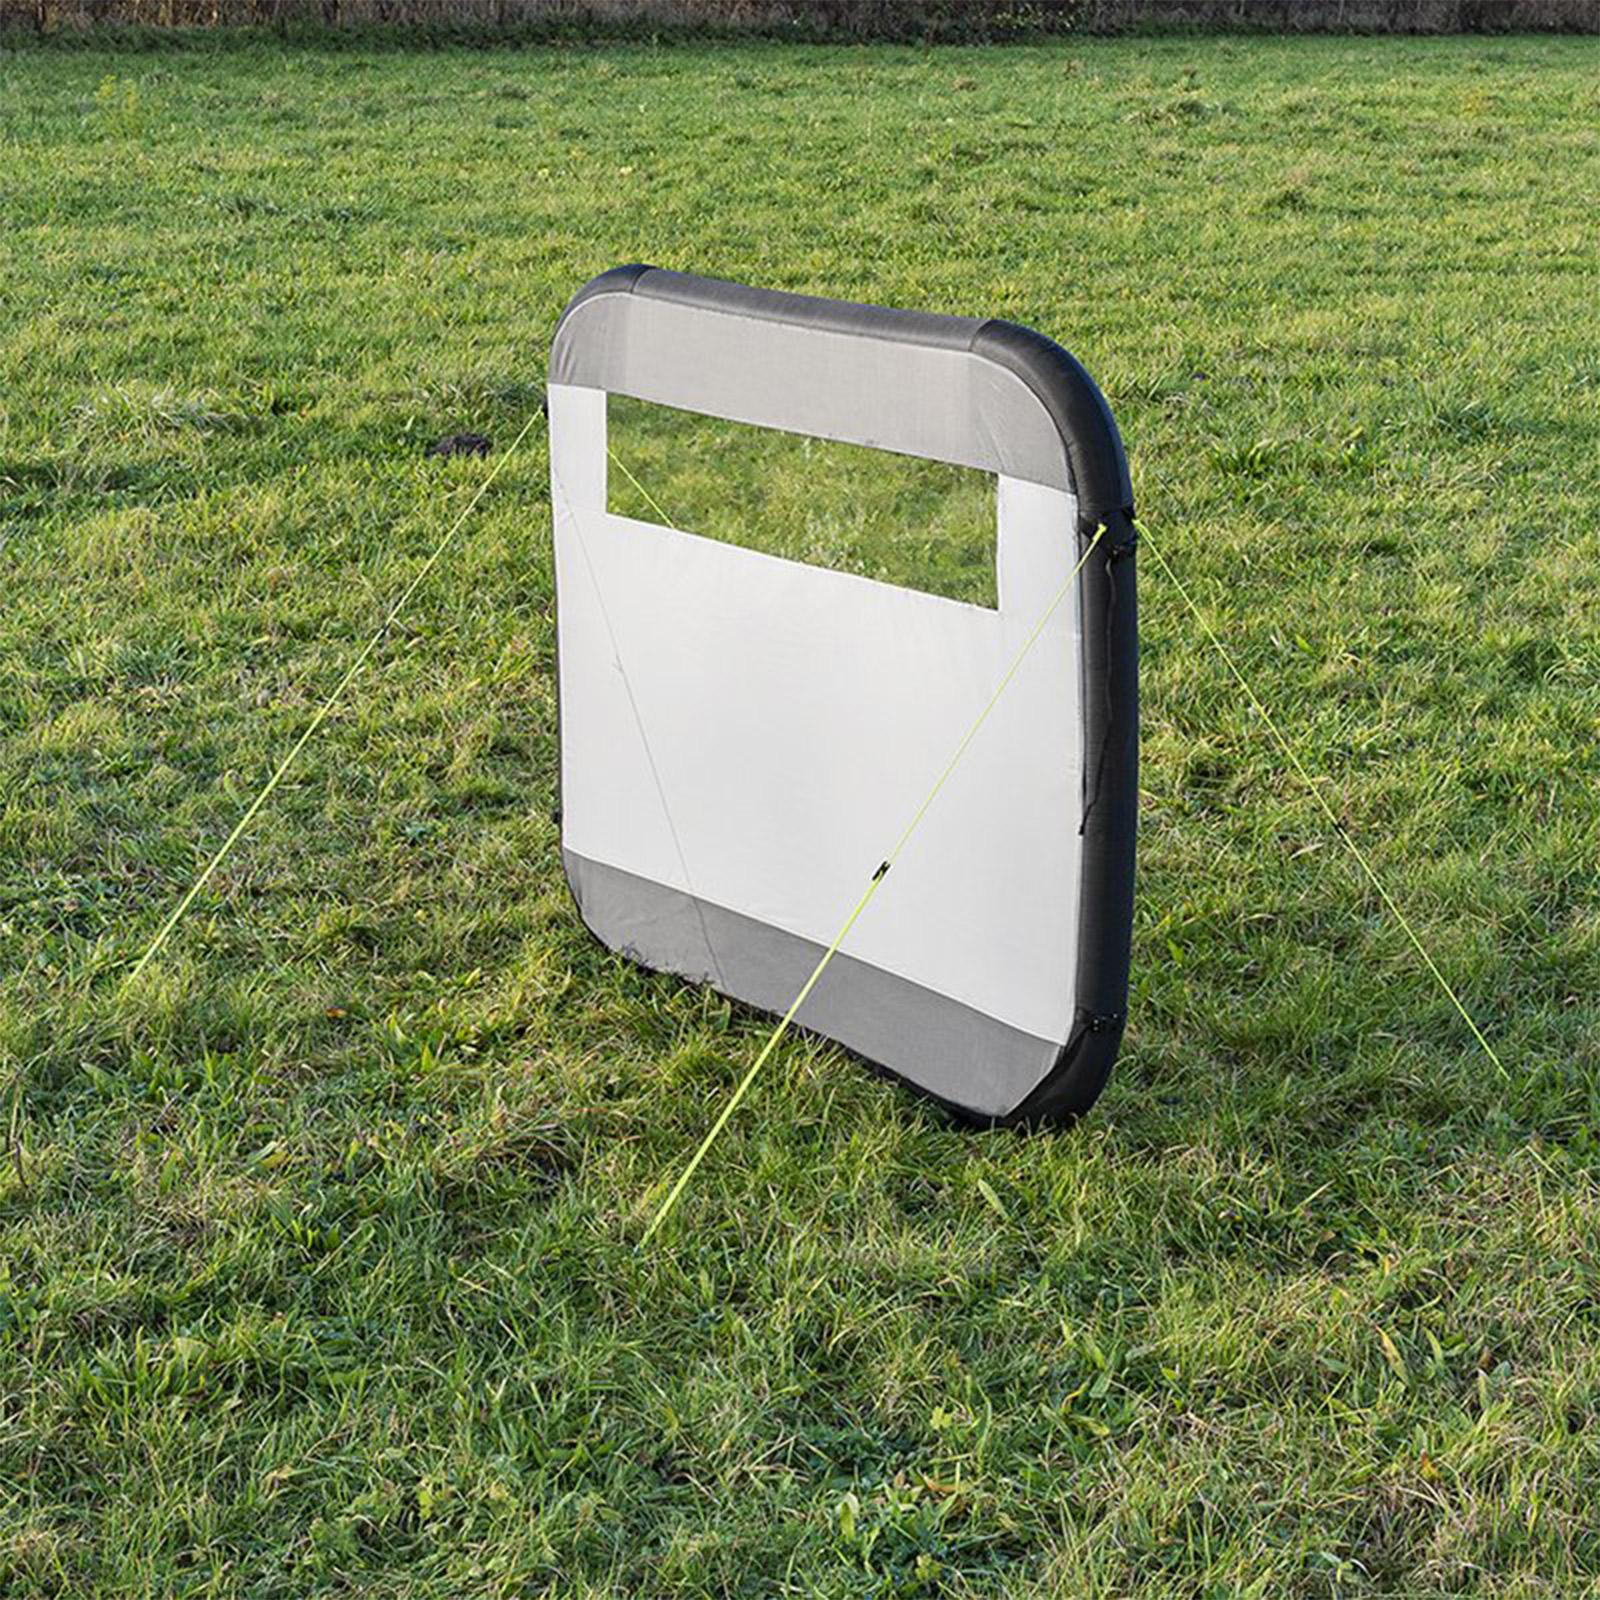 Windschutz Windbarikade aufblasbar | 150D Polyester | 160x140 cm | grau